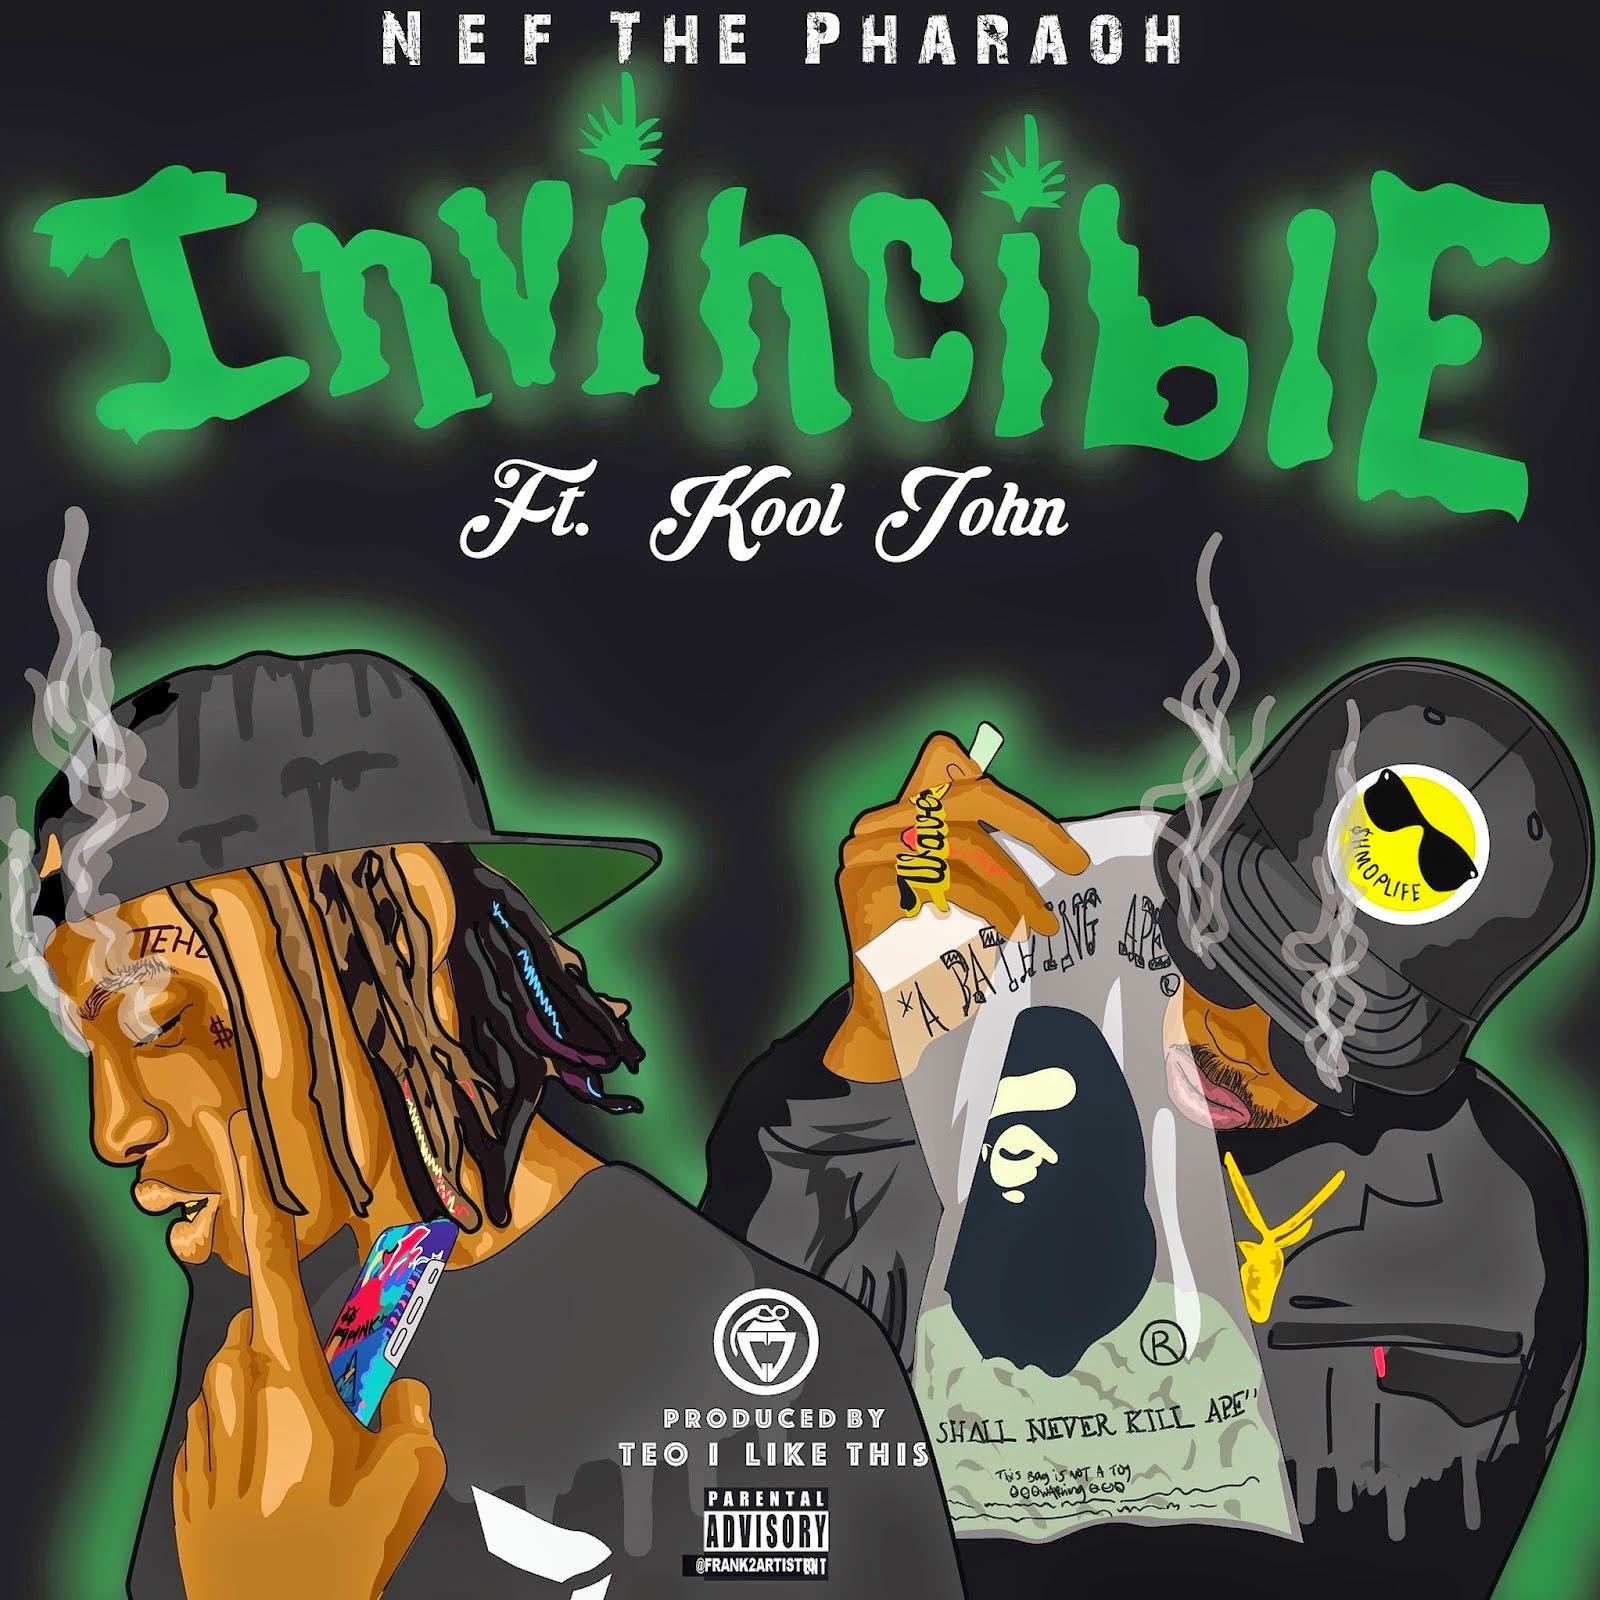 Nef The Pharaoh - Invincible ft Kool John / www.hiphopondeck.com